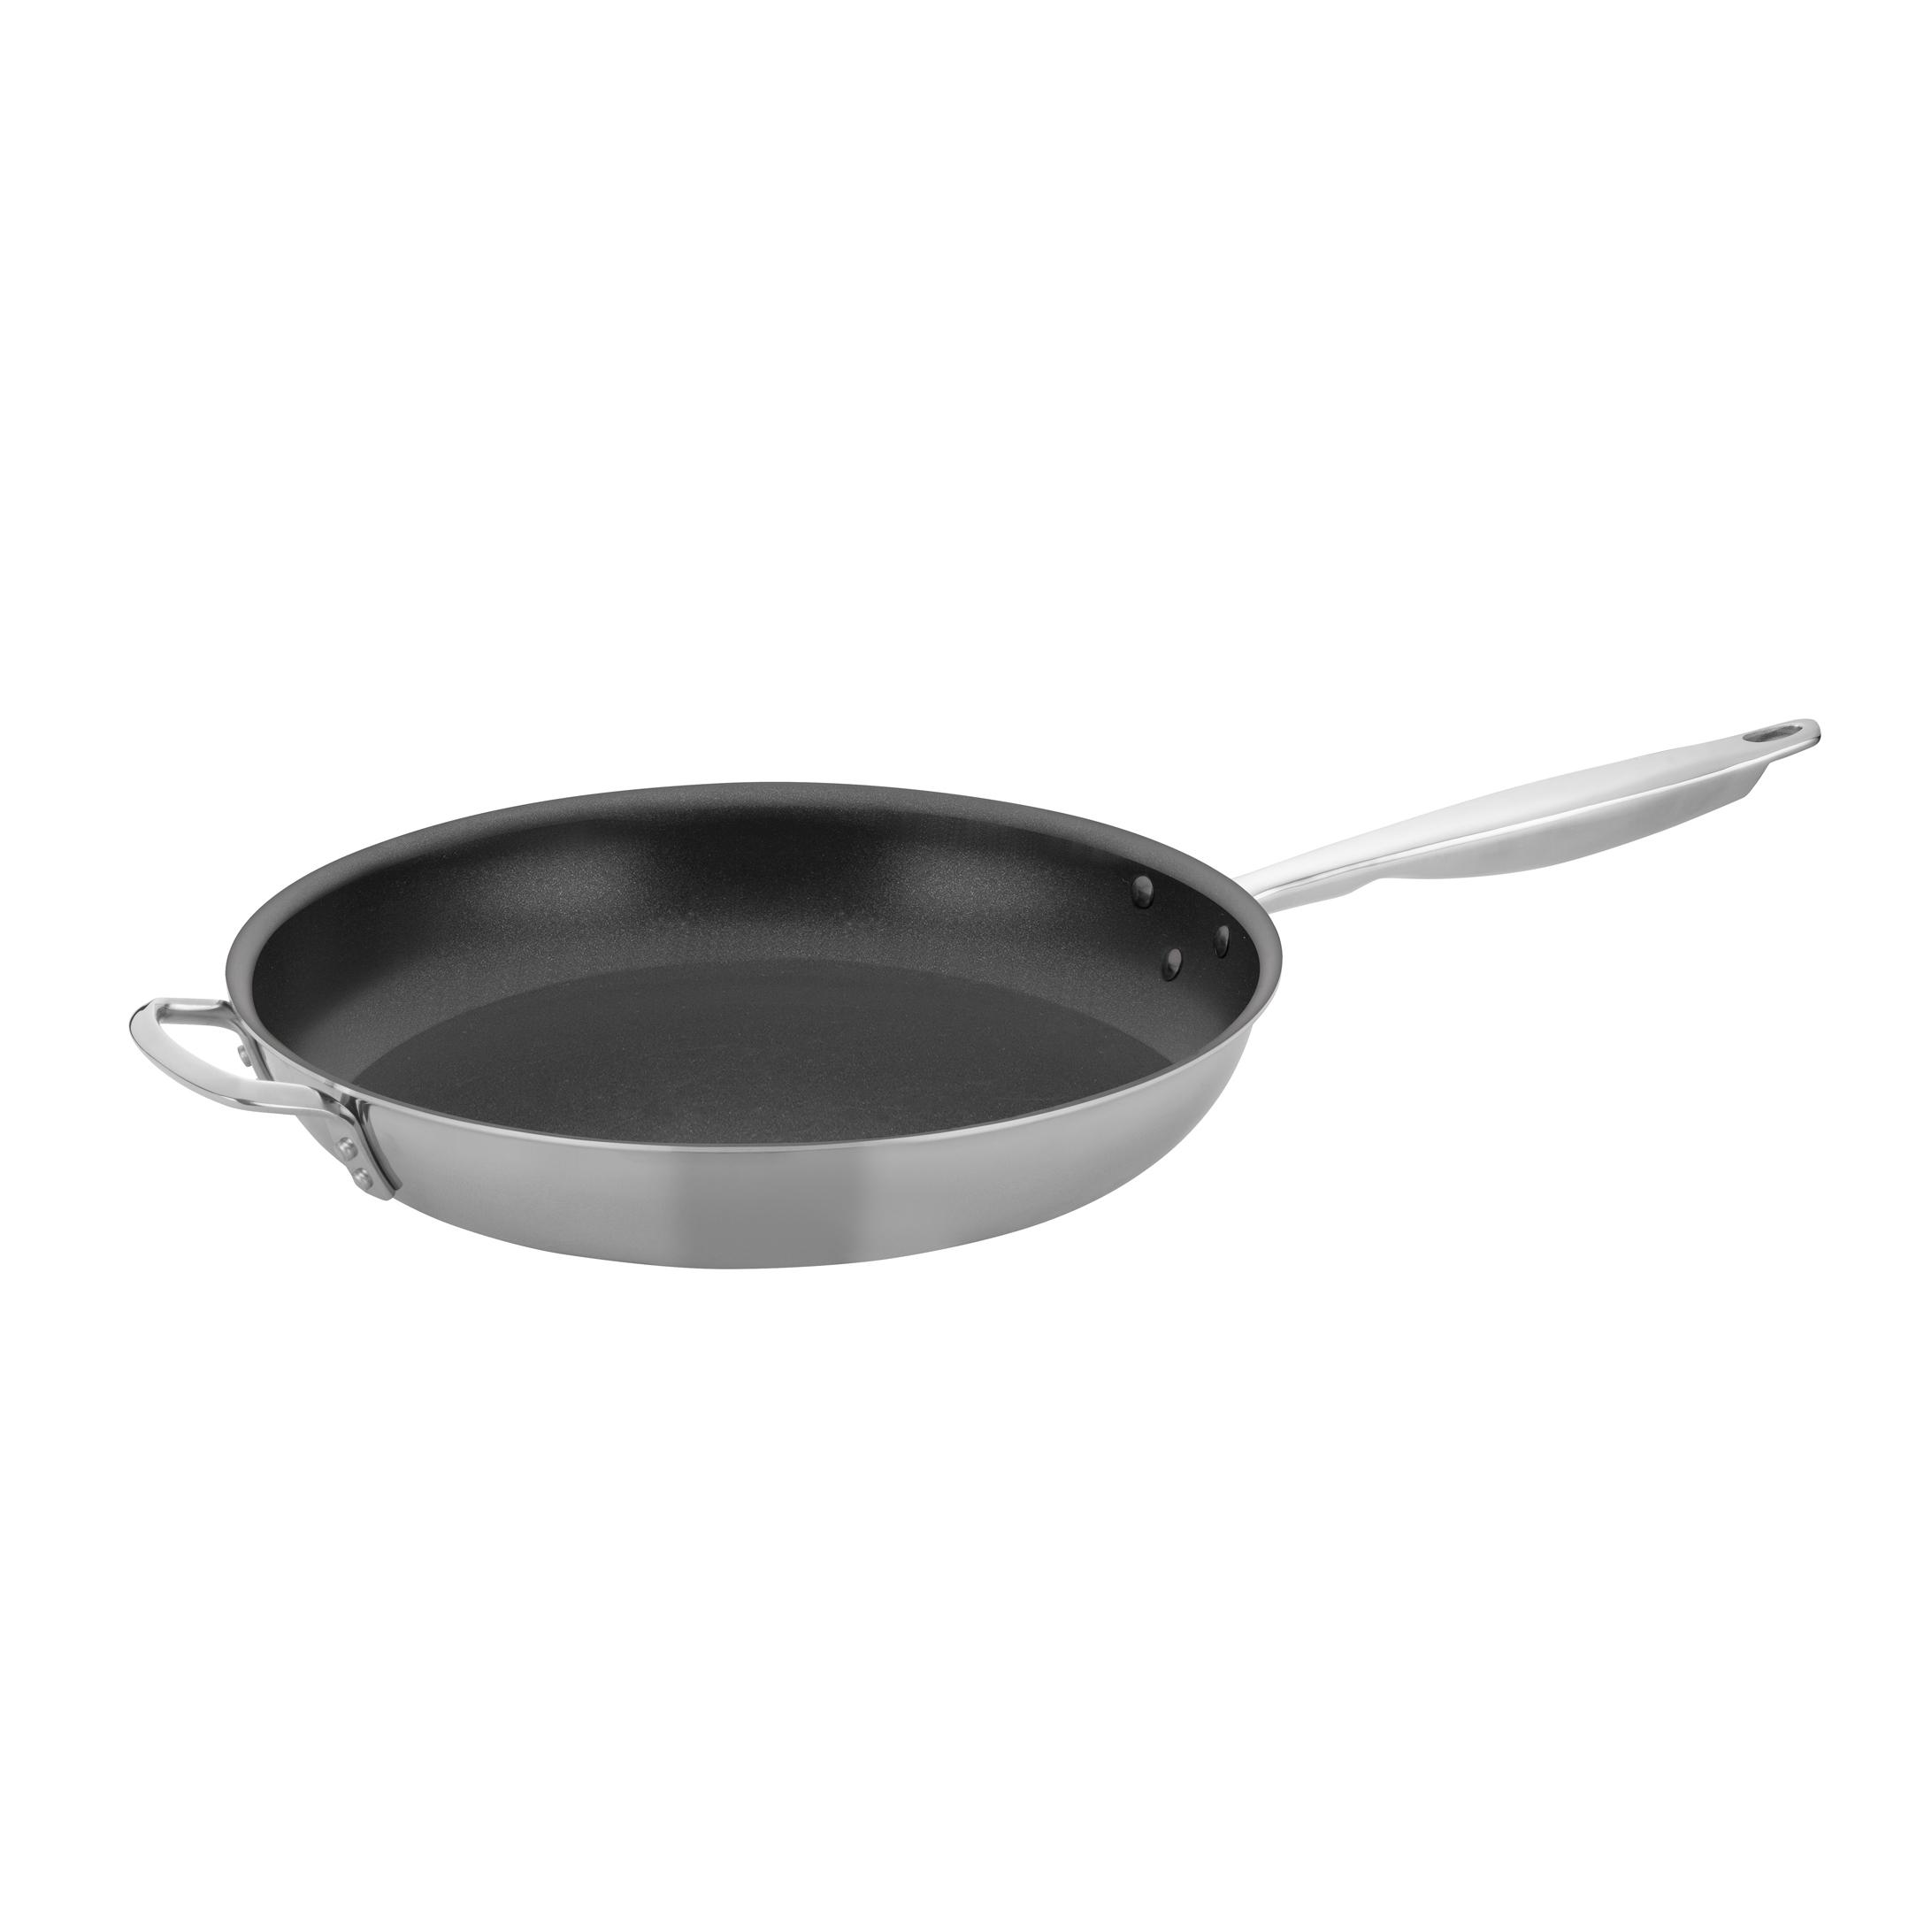 Winco TGFP-14NS fry pan